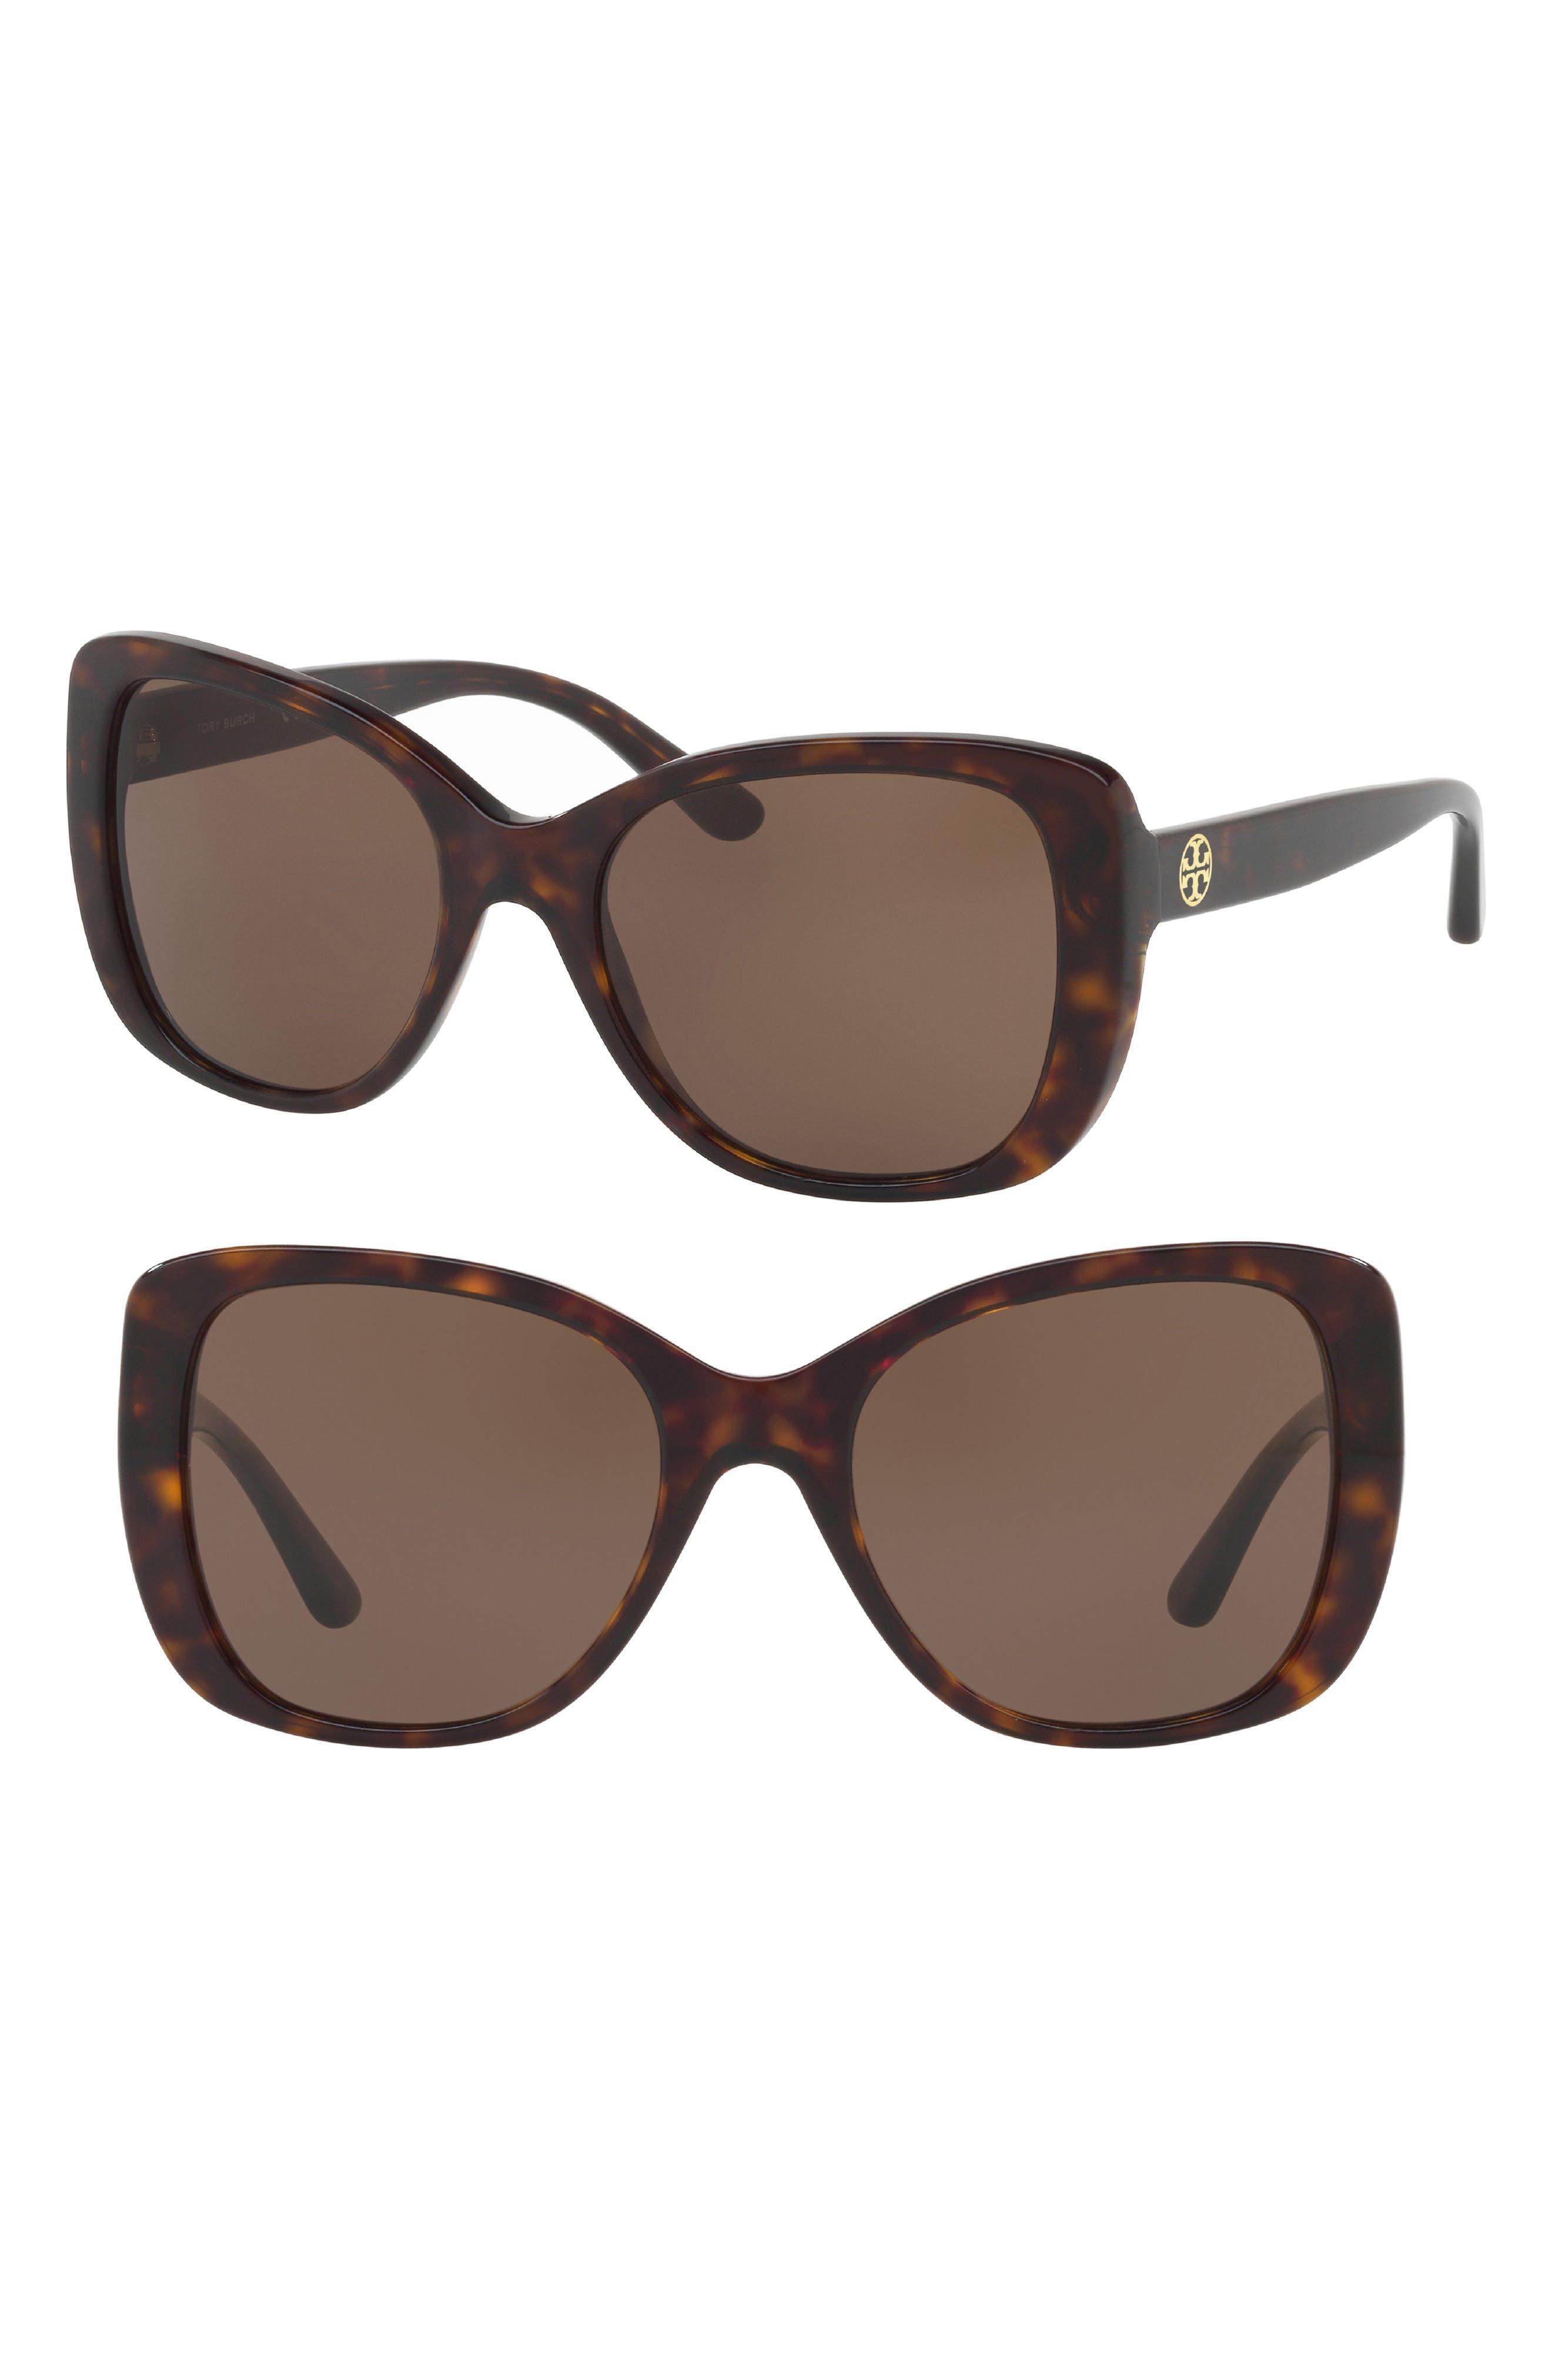 Tory Burch 53mm Rectangle Sunglasses